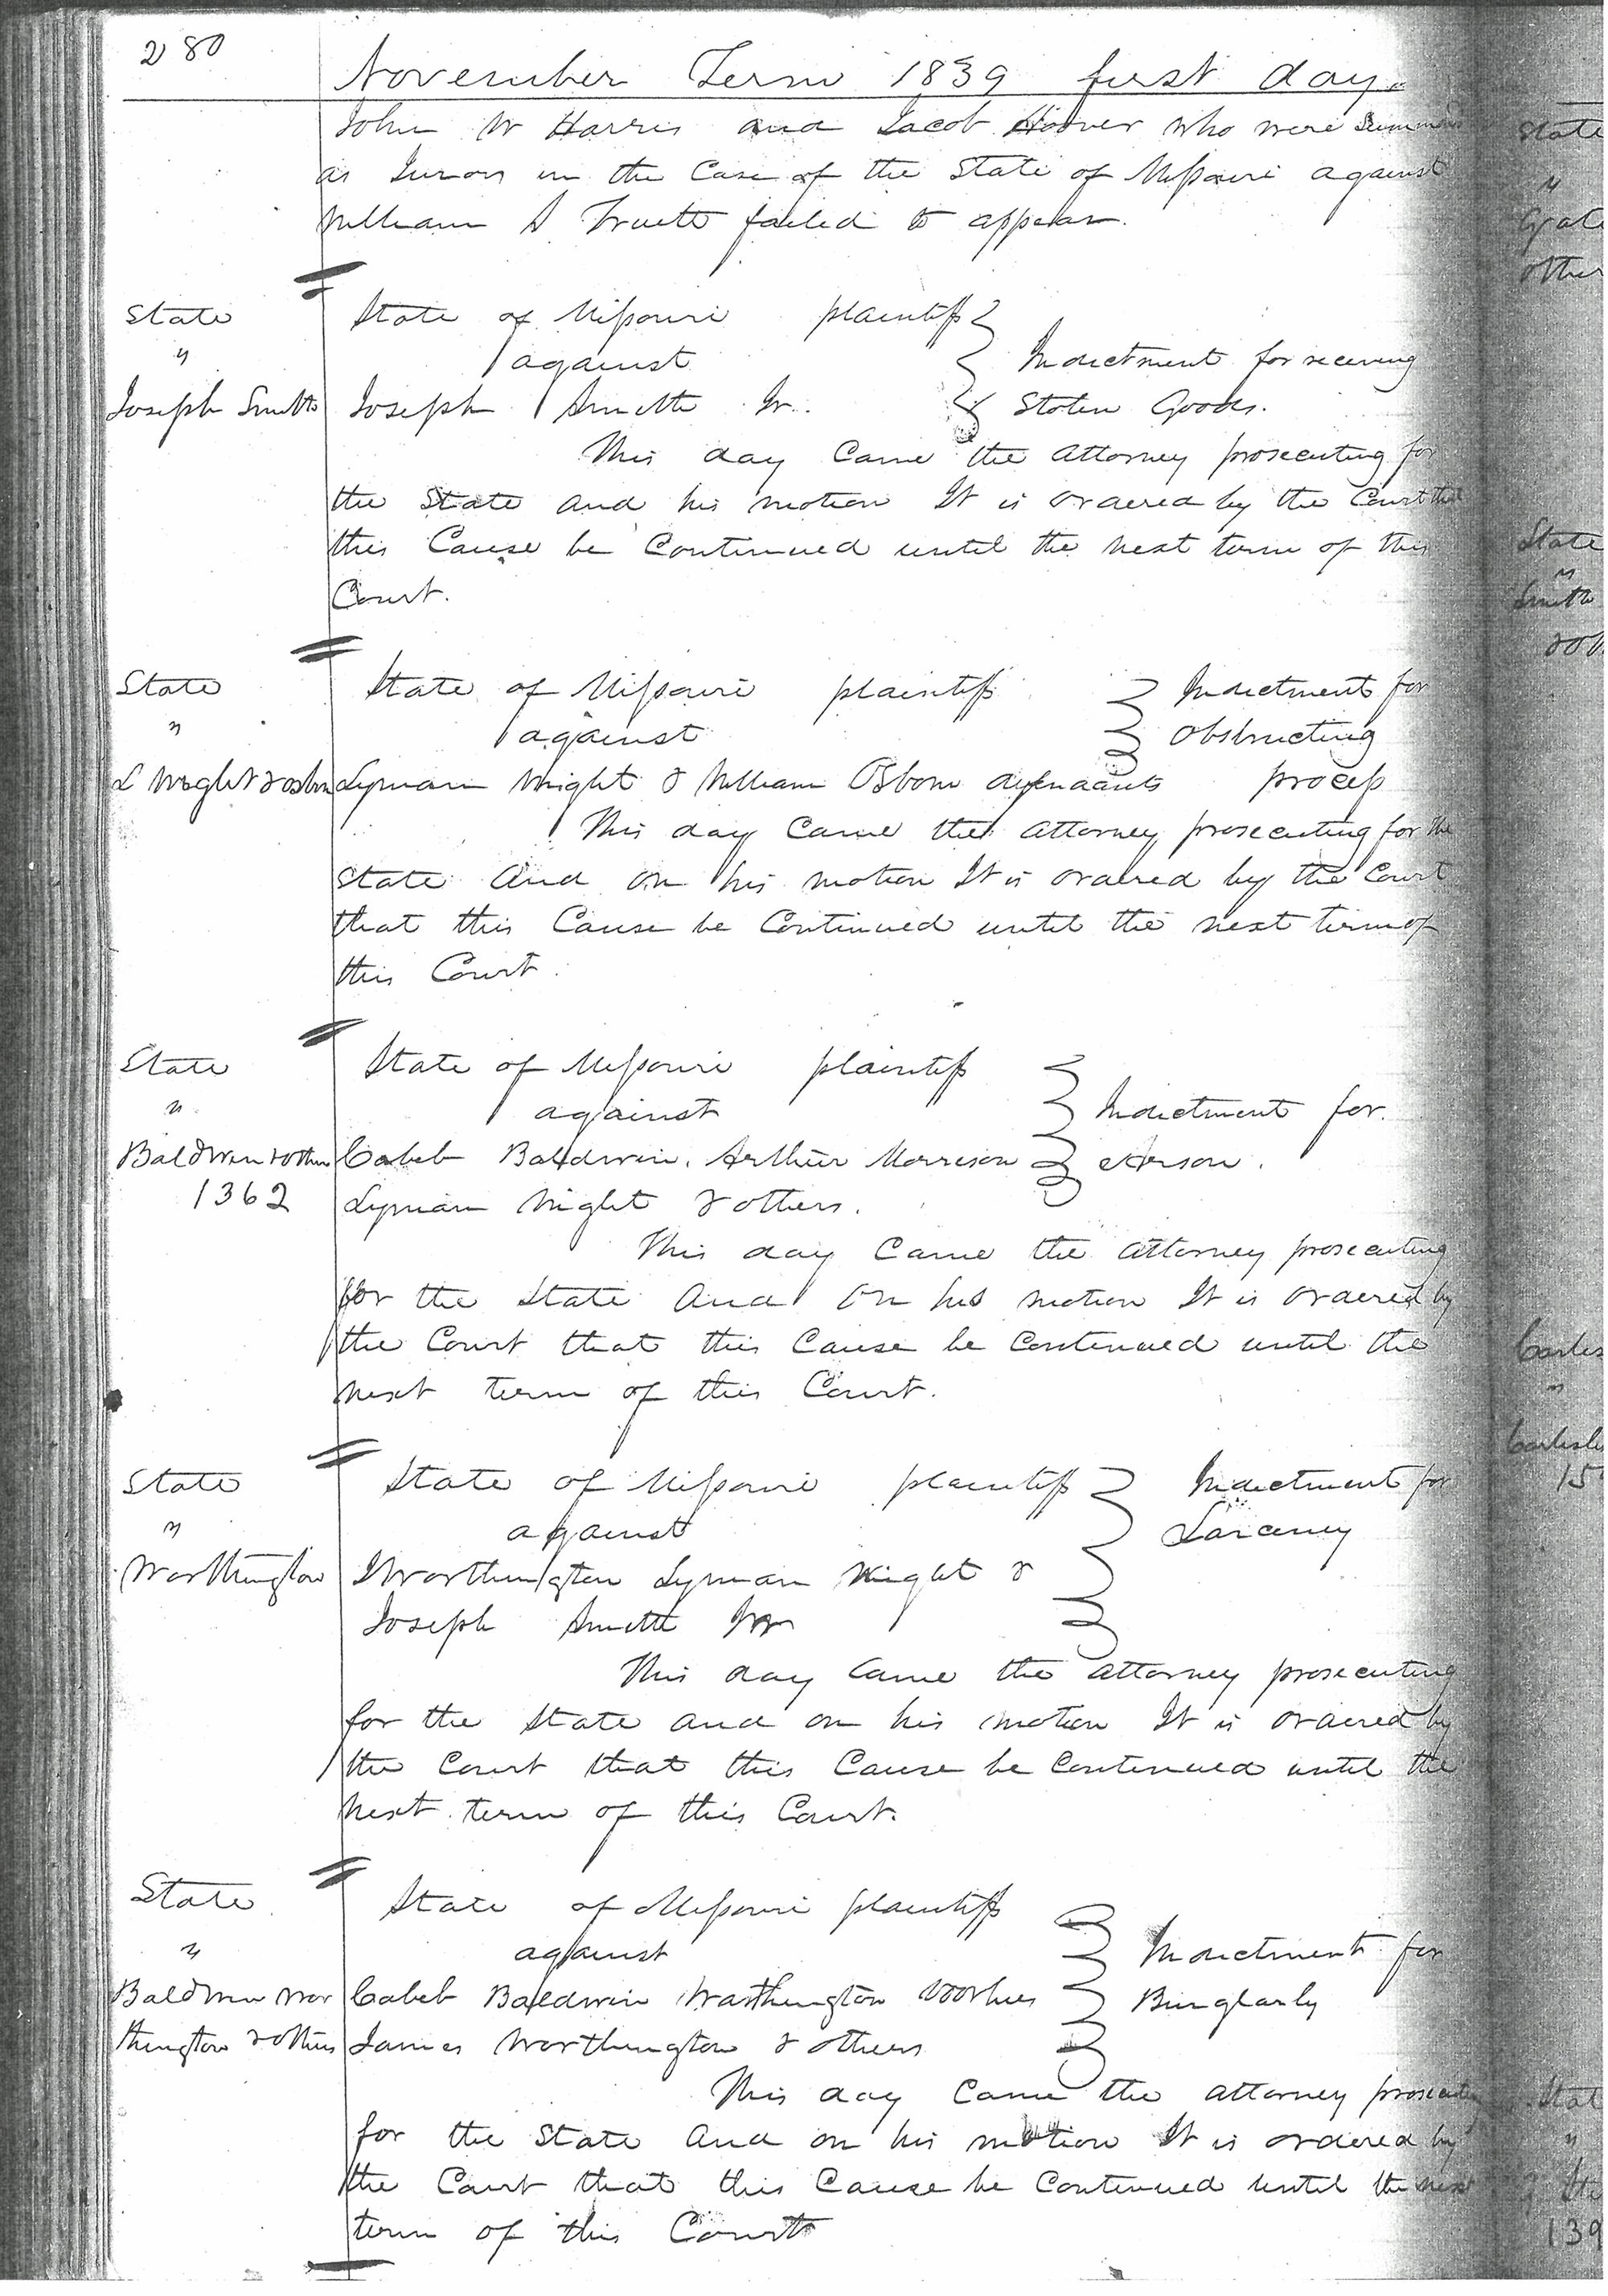 Docket Entry, Continuance, 4 November 1839 [State of Missouri v